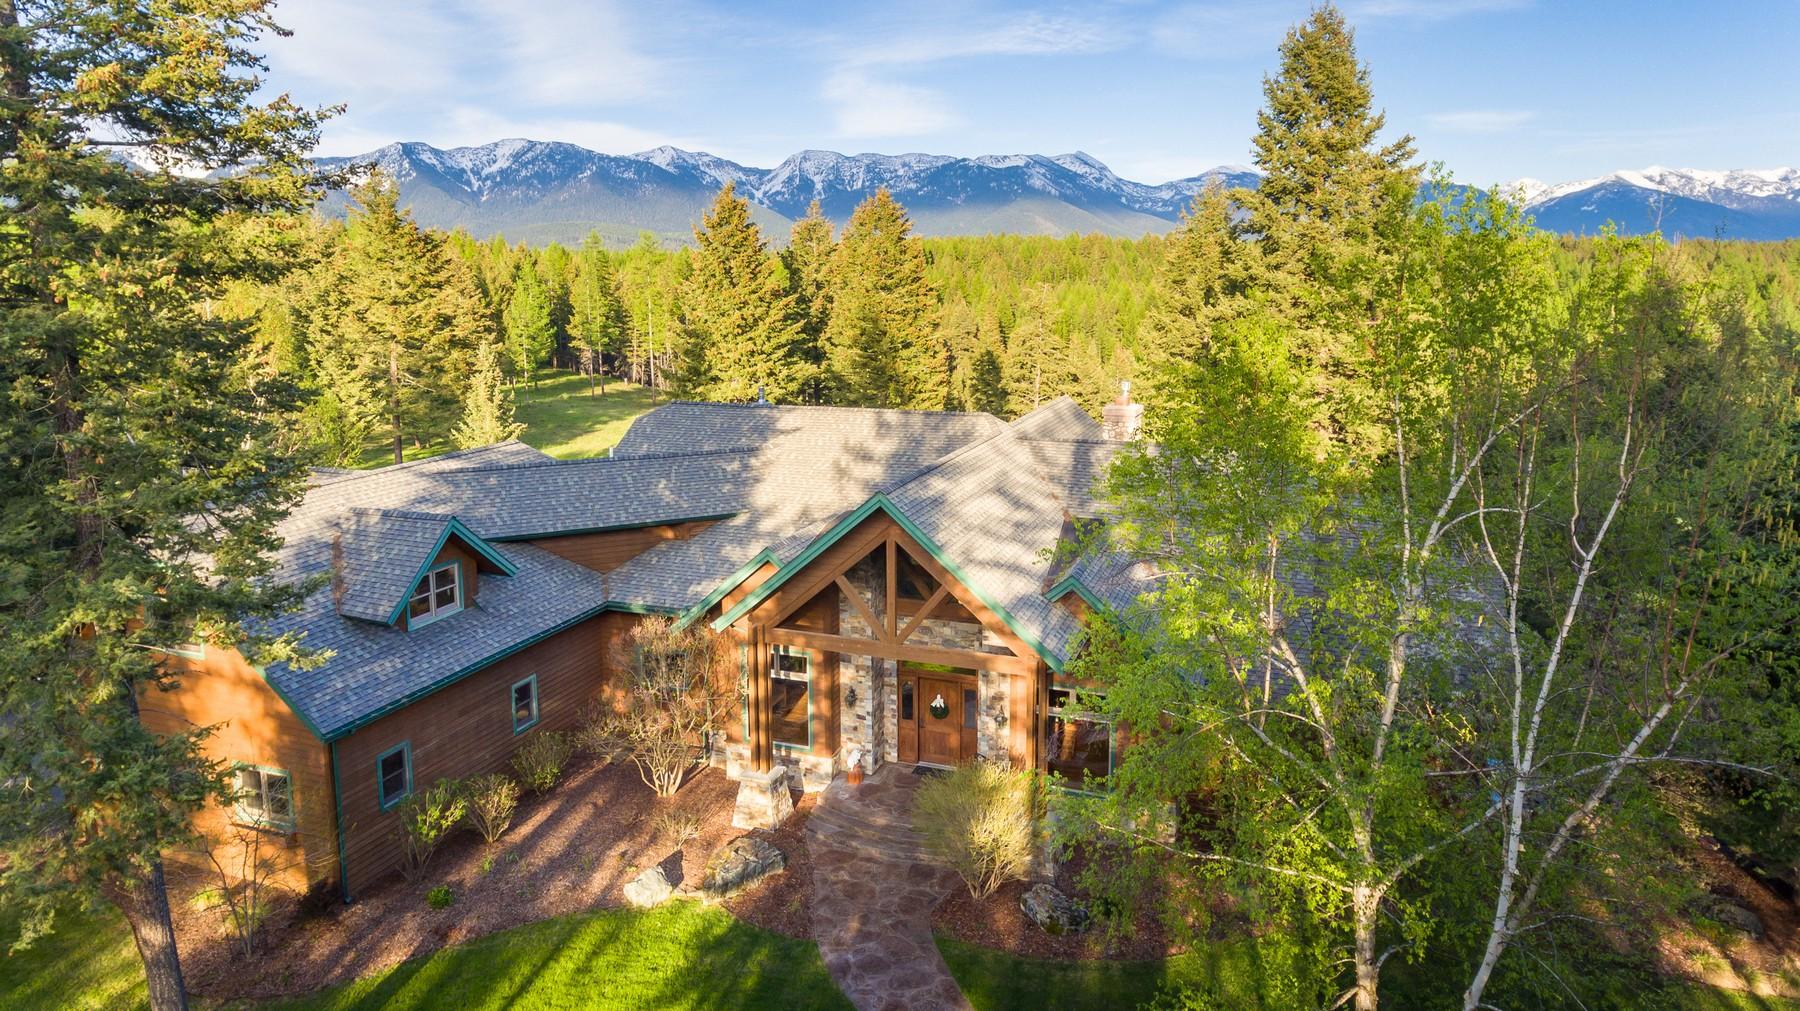 Villa per Vendita alle ore 10 Sky Ln , Kalispell, MT 59901 10 Sky Ln Kalispell, Montana, 59901 Stati Uniti